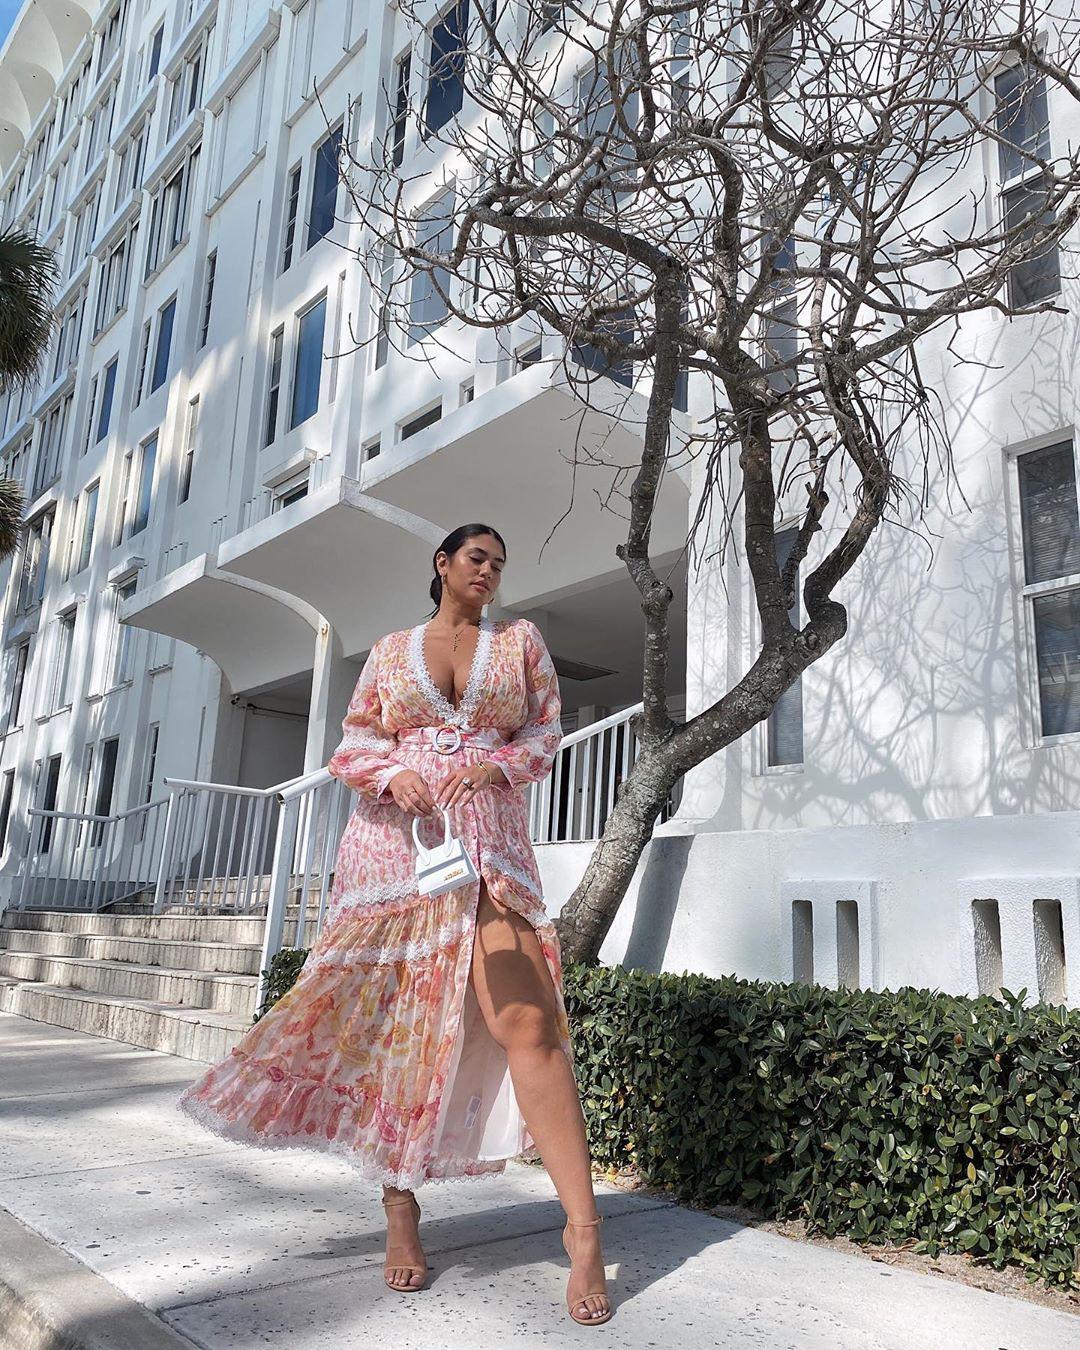 White and pink dress, girls instagram photos, wardrobe ideas